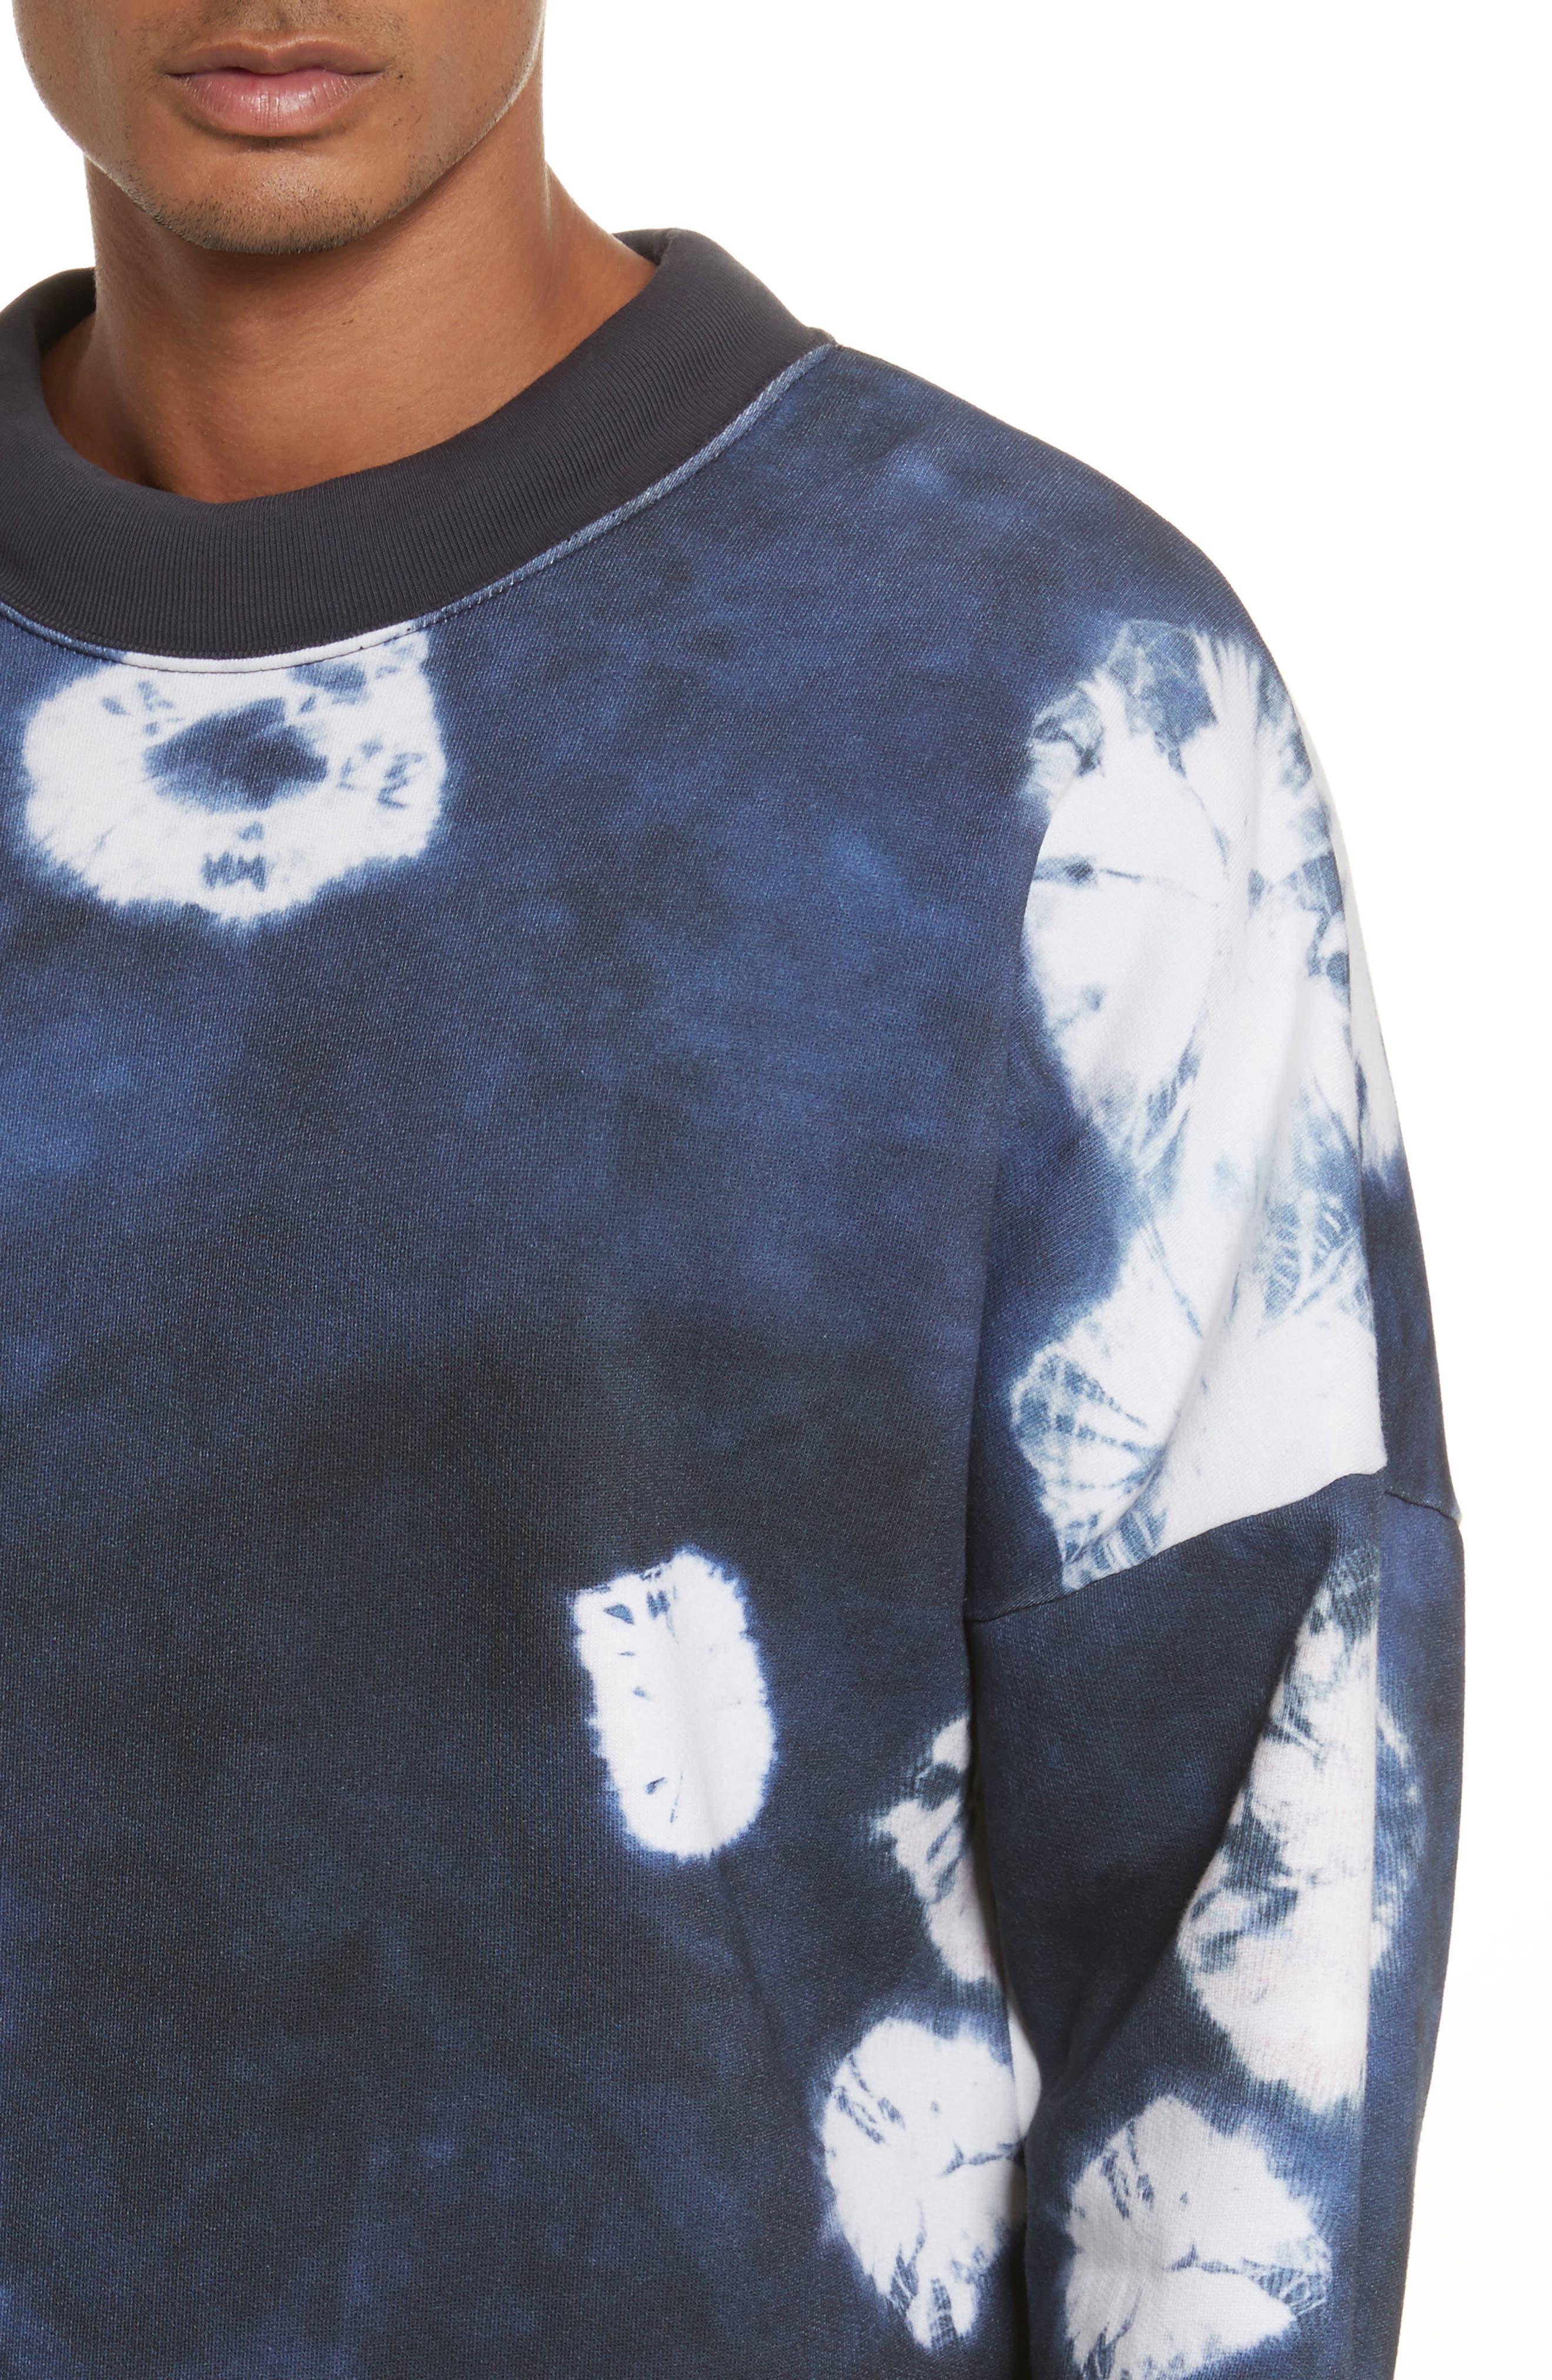 Fellke Bleach Indigo Sweatshirt,                             Alternate thumbnail 4, color,                             410